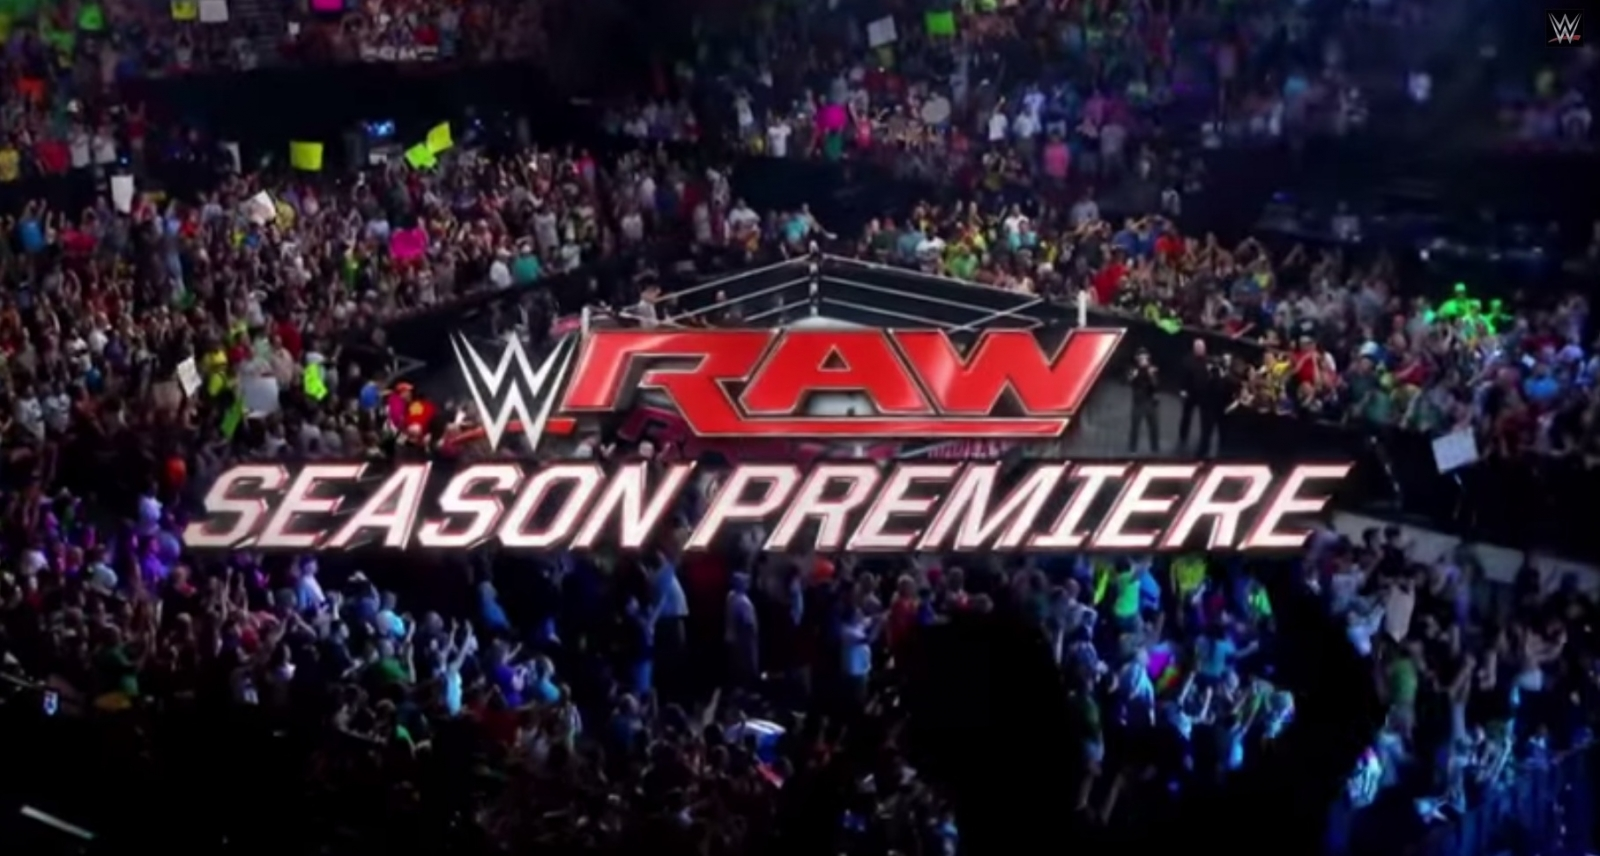 Wwe Raw Where To Watch Season Premiere Live Stream Online